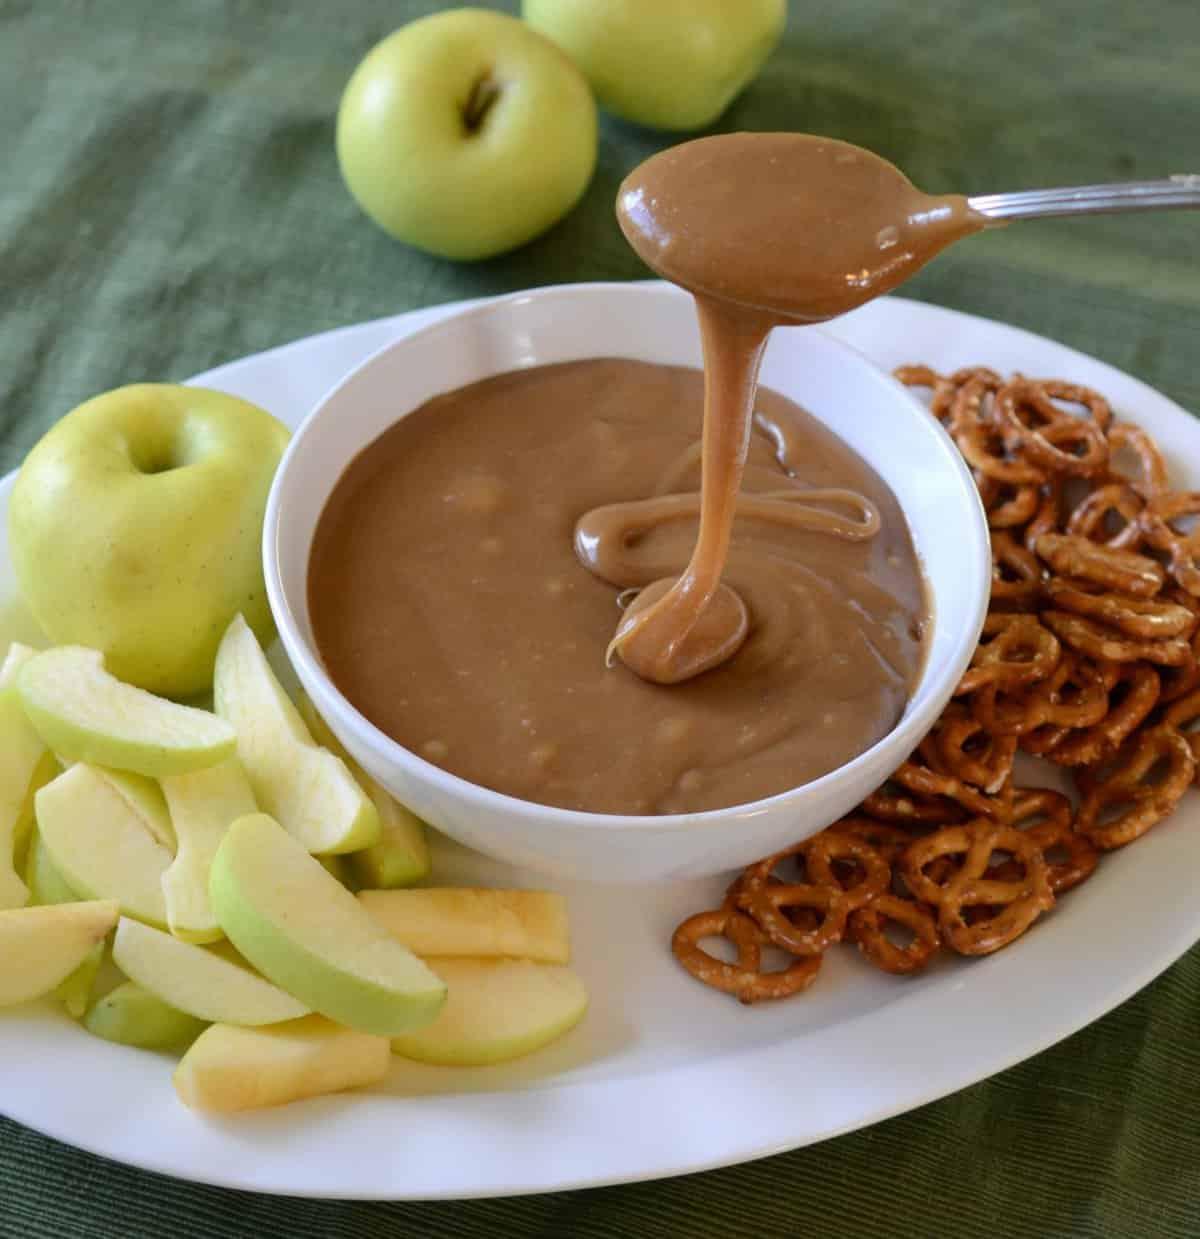 perfect caramel dip for apples and pretzels